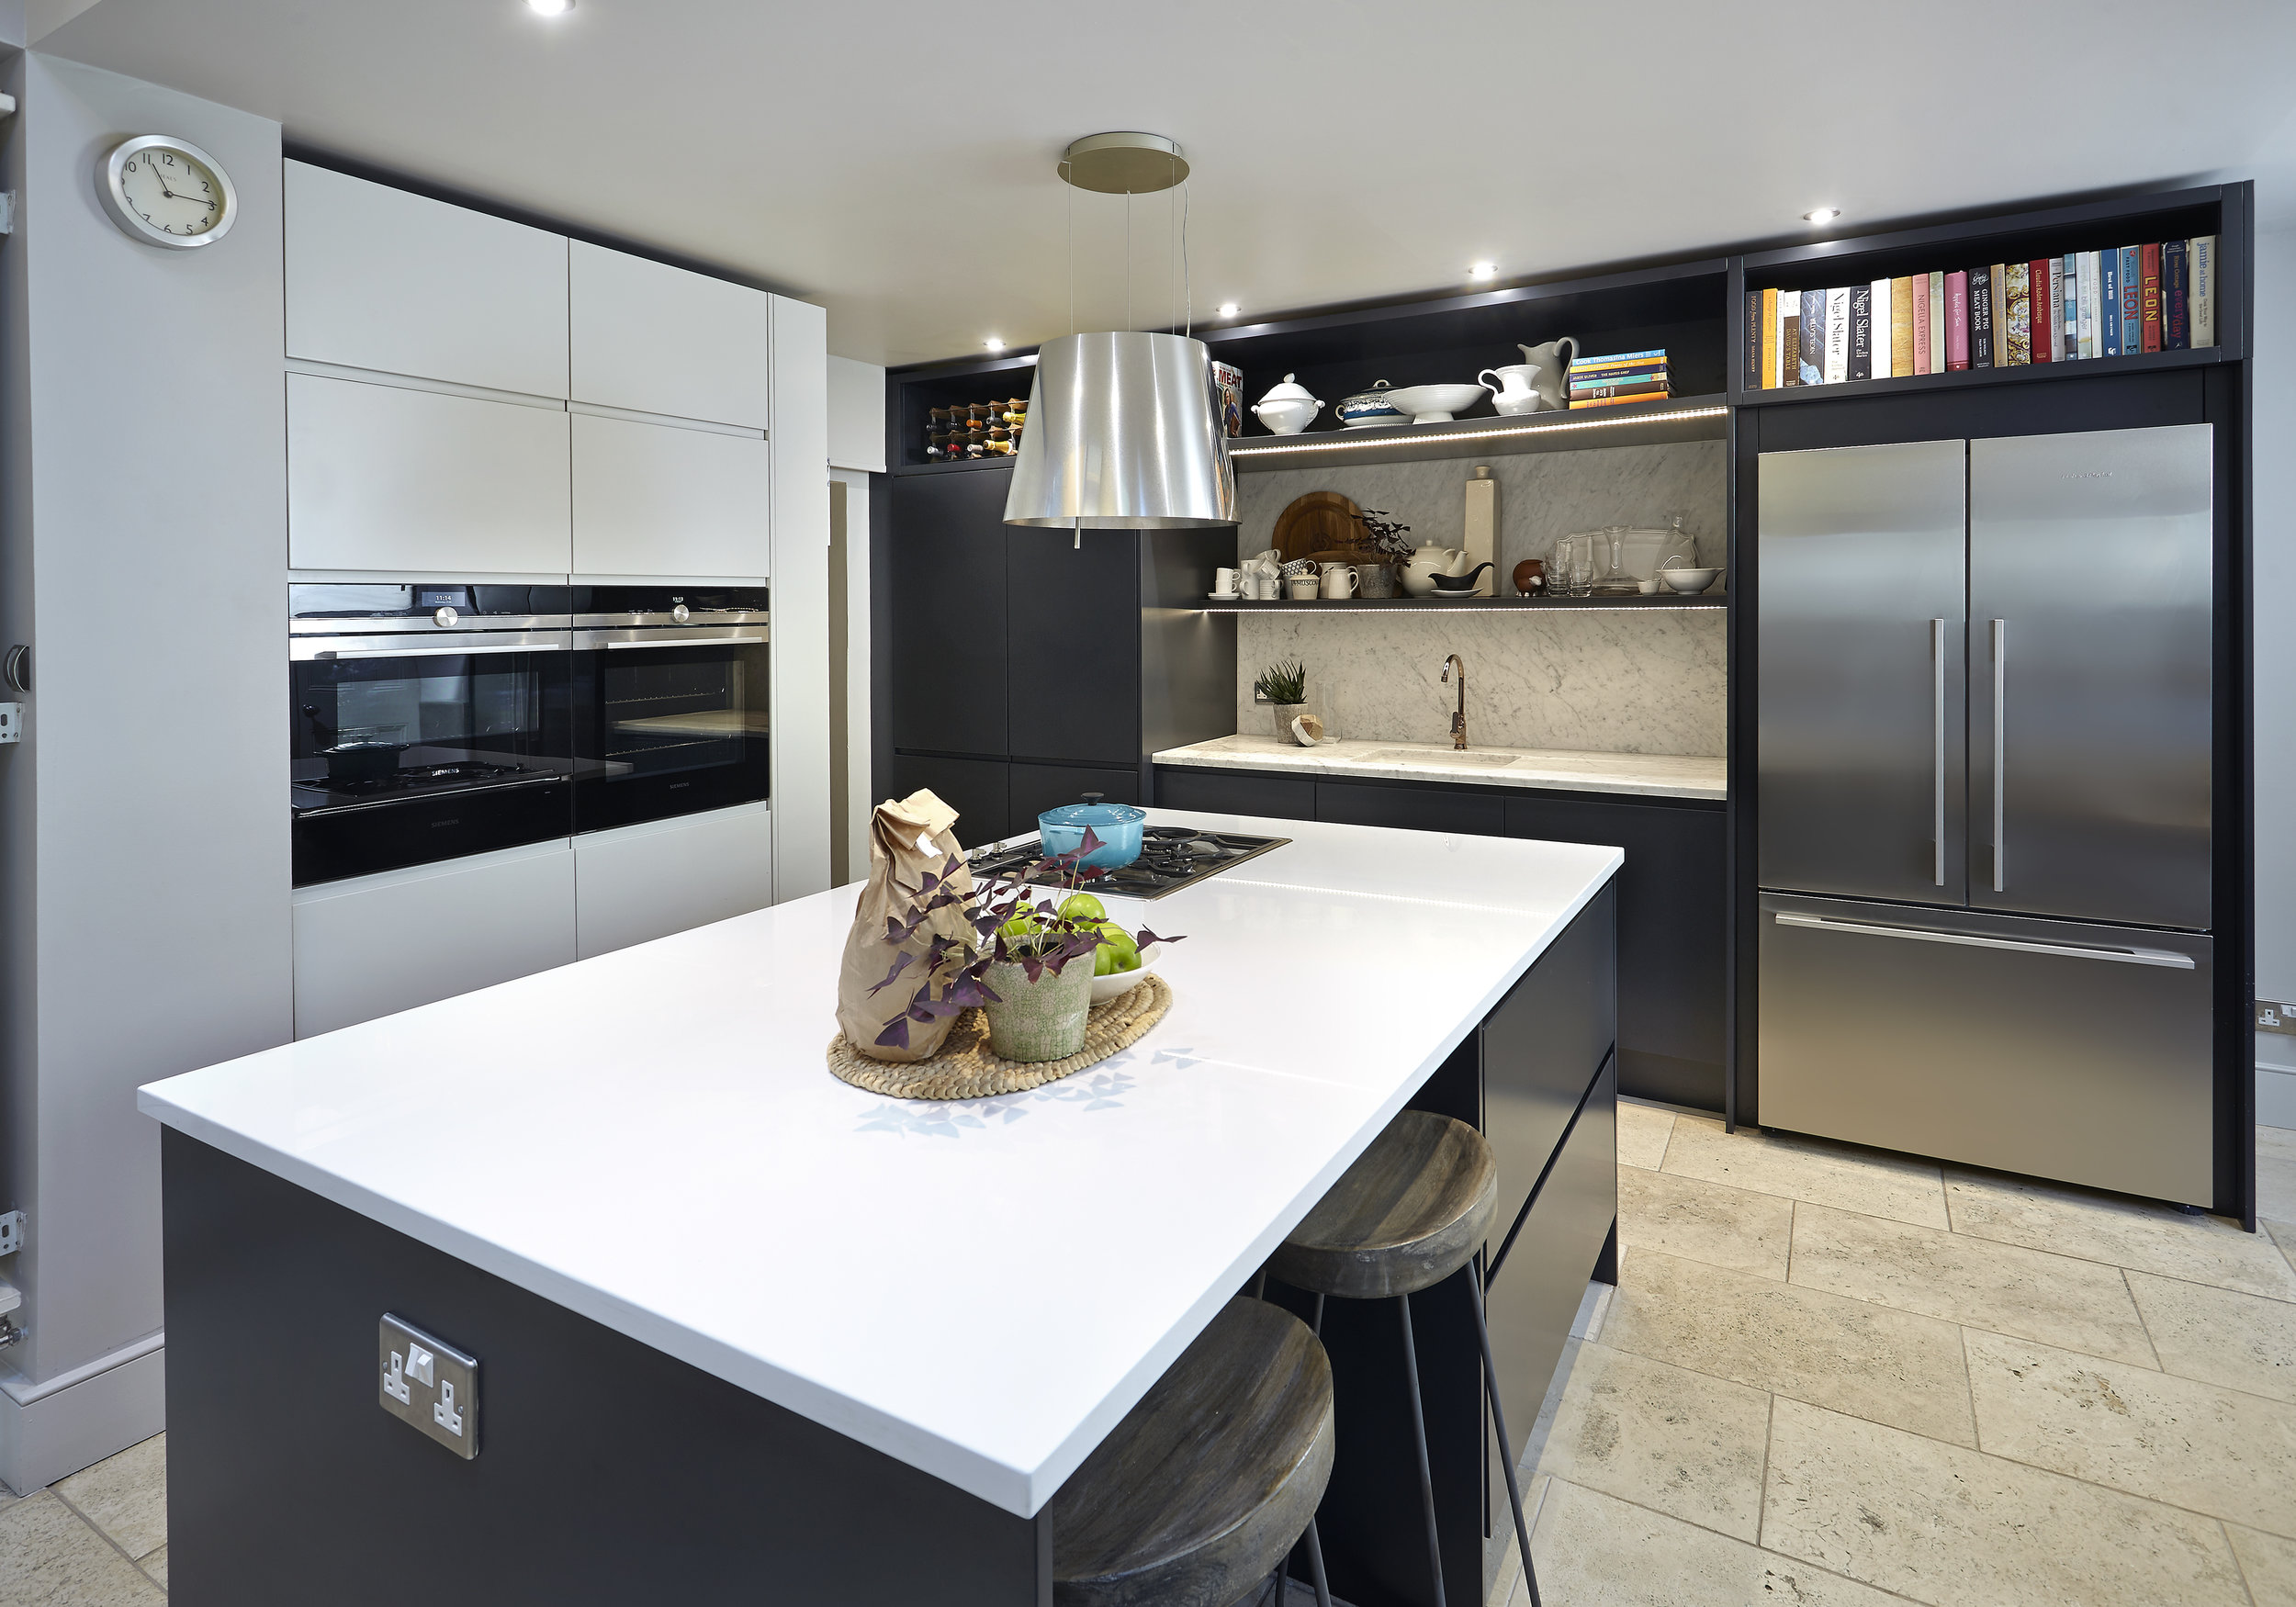 kitchens1097.jpg